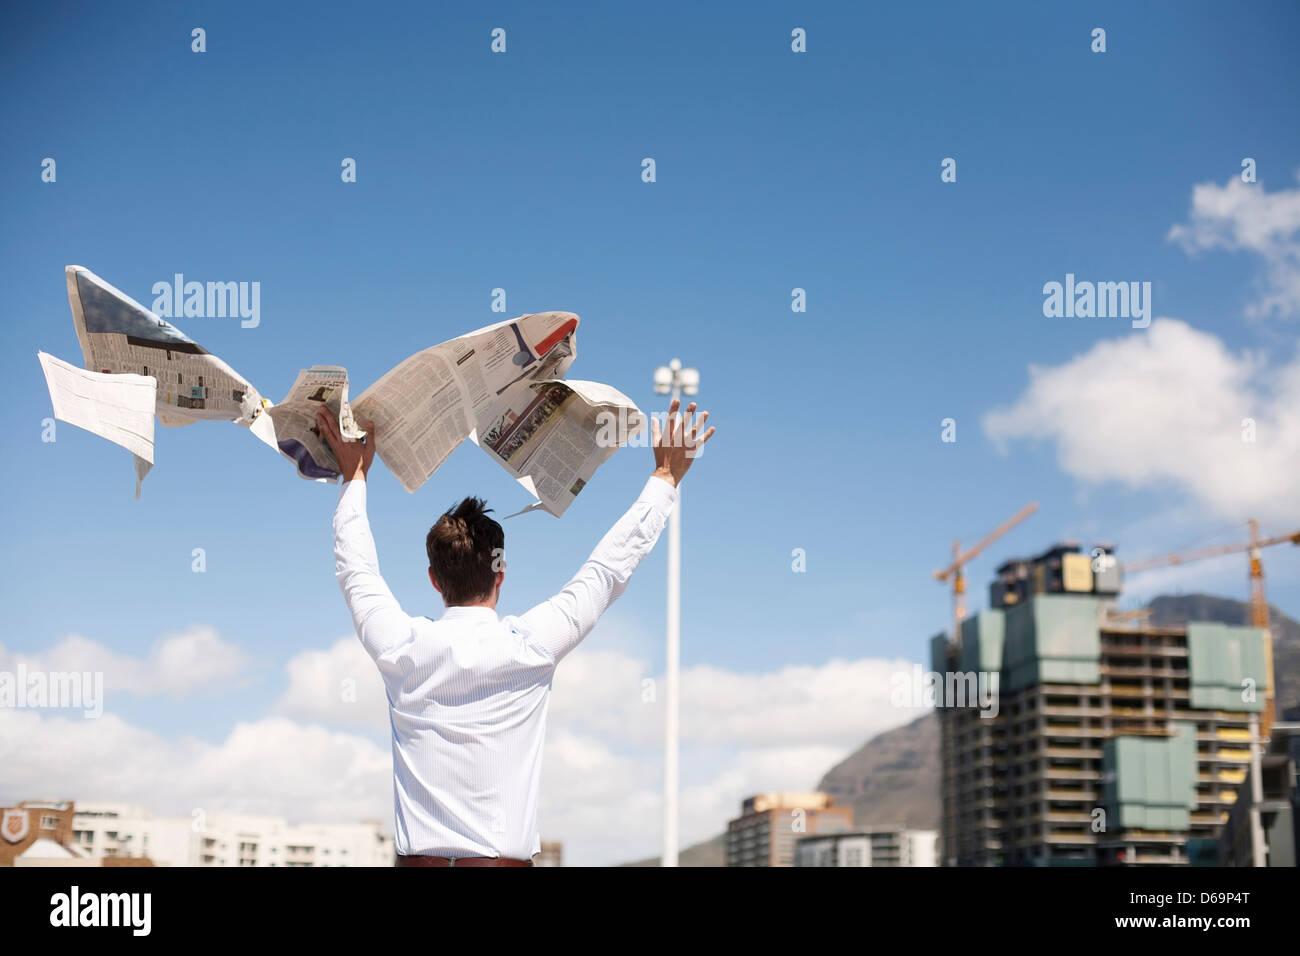 Businessman throwing newspaper in air - Stock Image